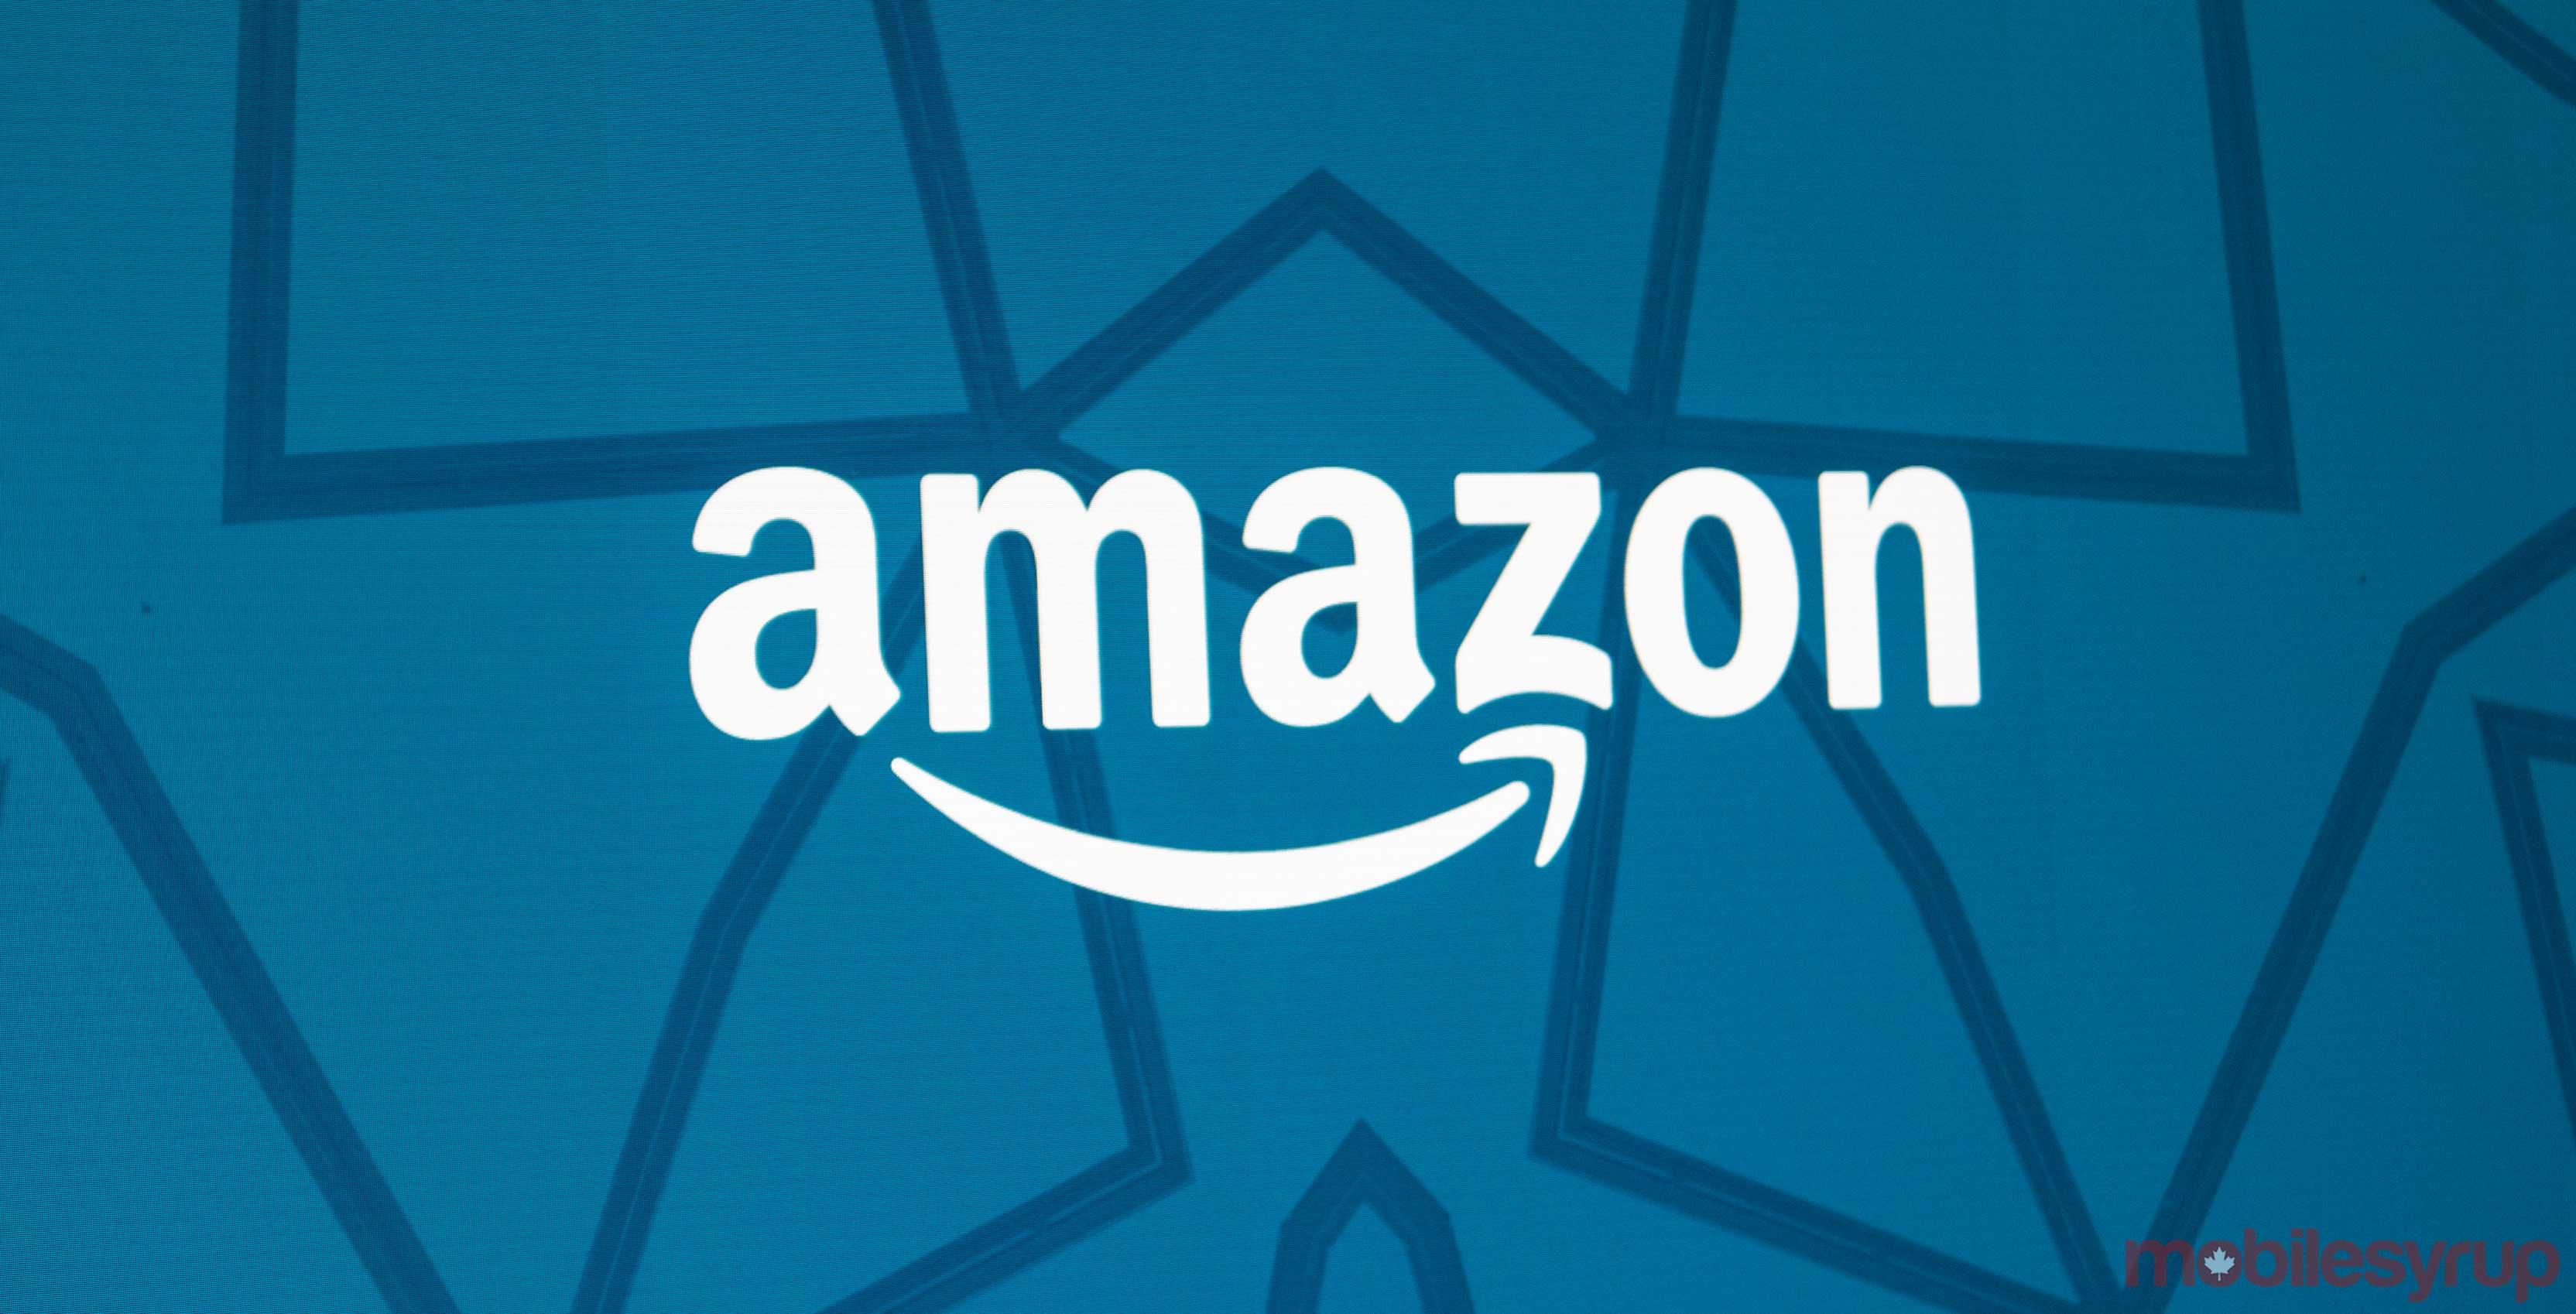 Amazon Canada reveals upcoming Black Friday tech deals